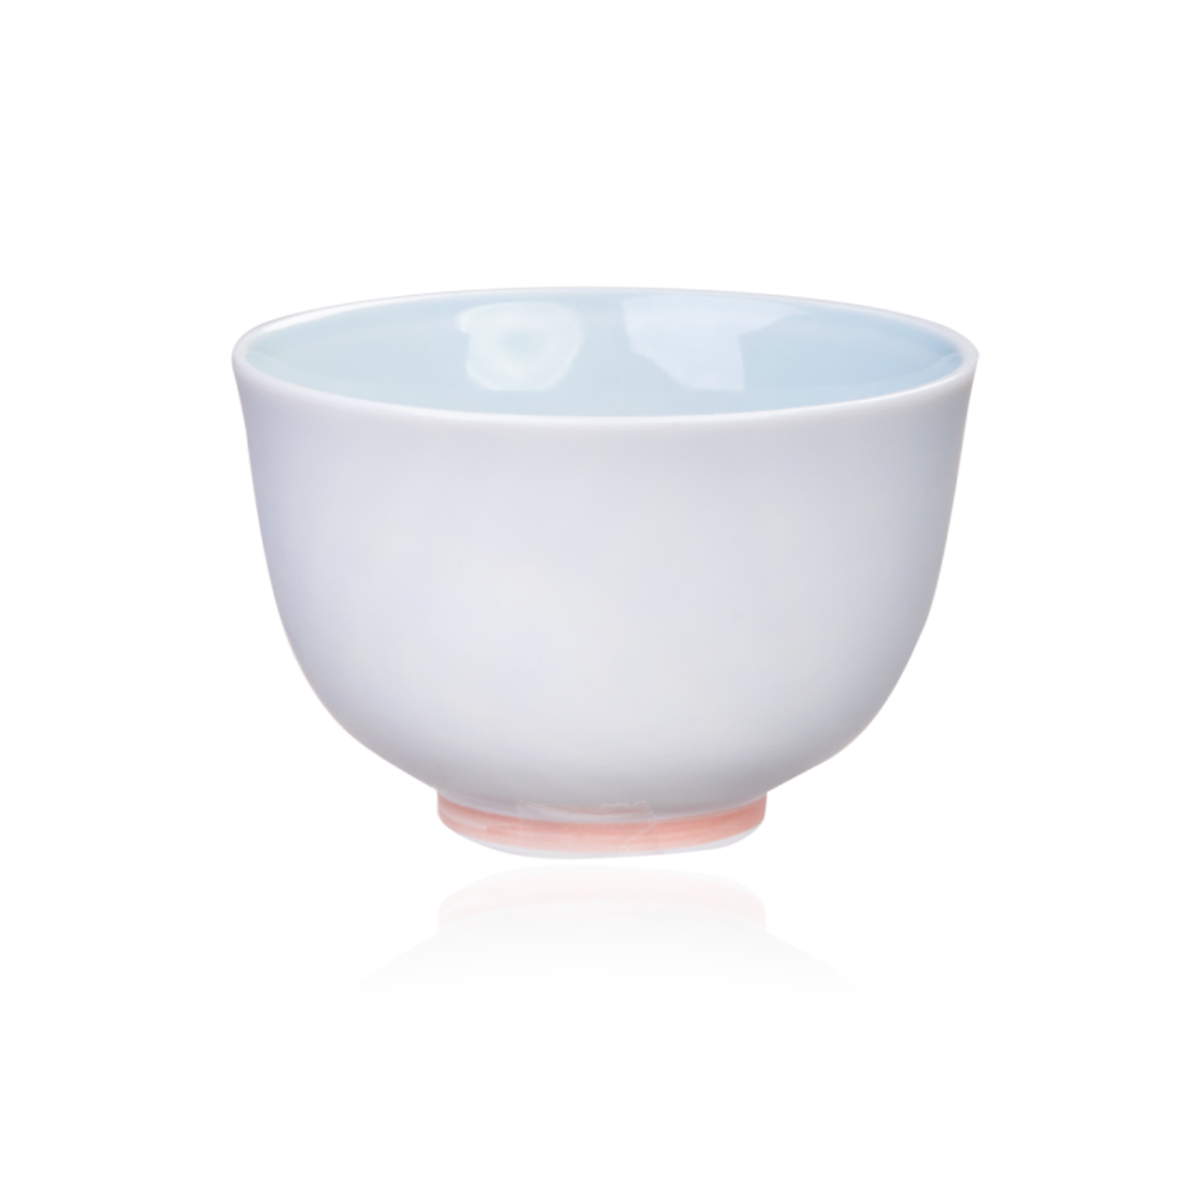 Czarka porcelanowa 150ml - Brown House & Tea